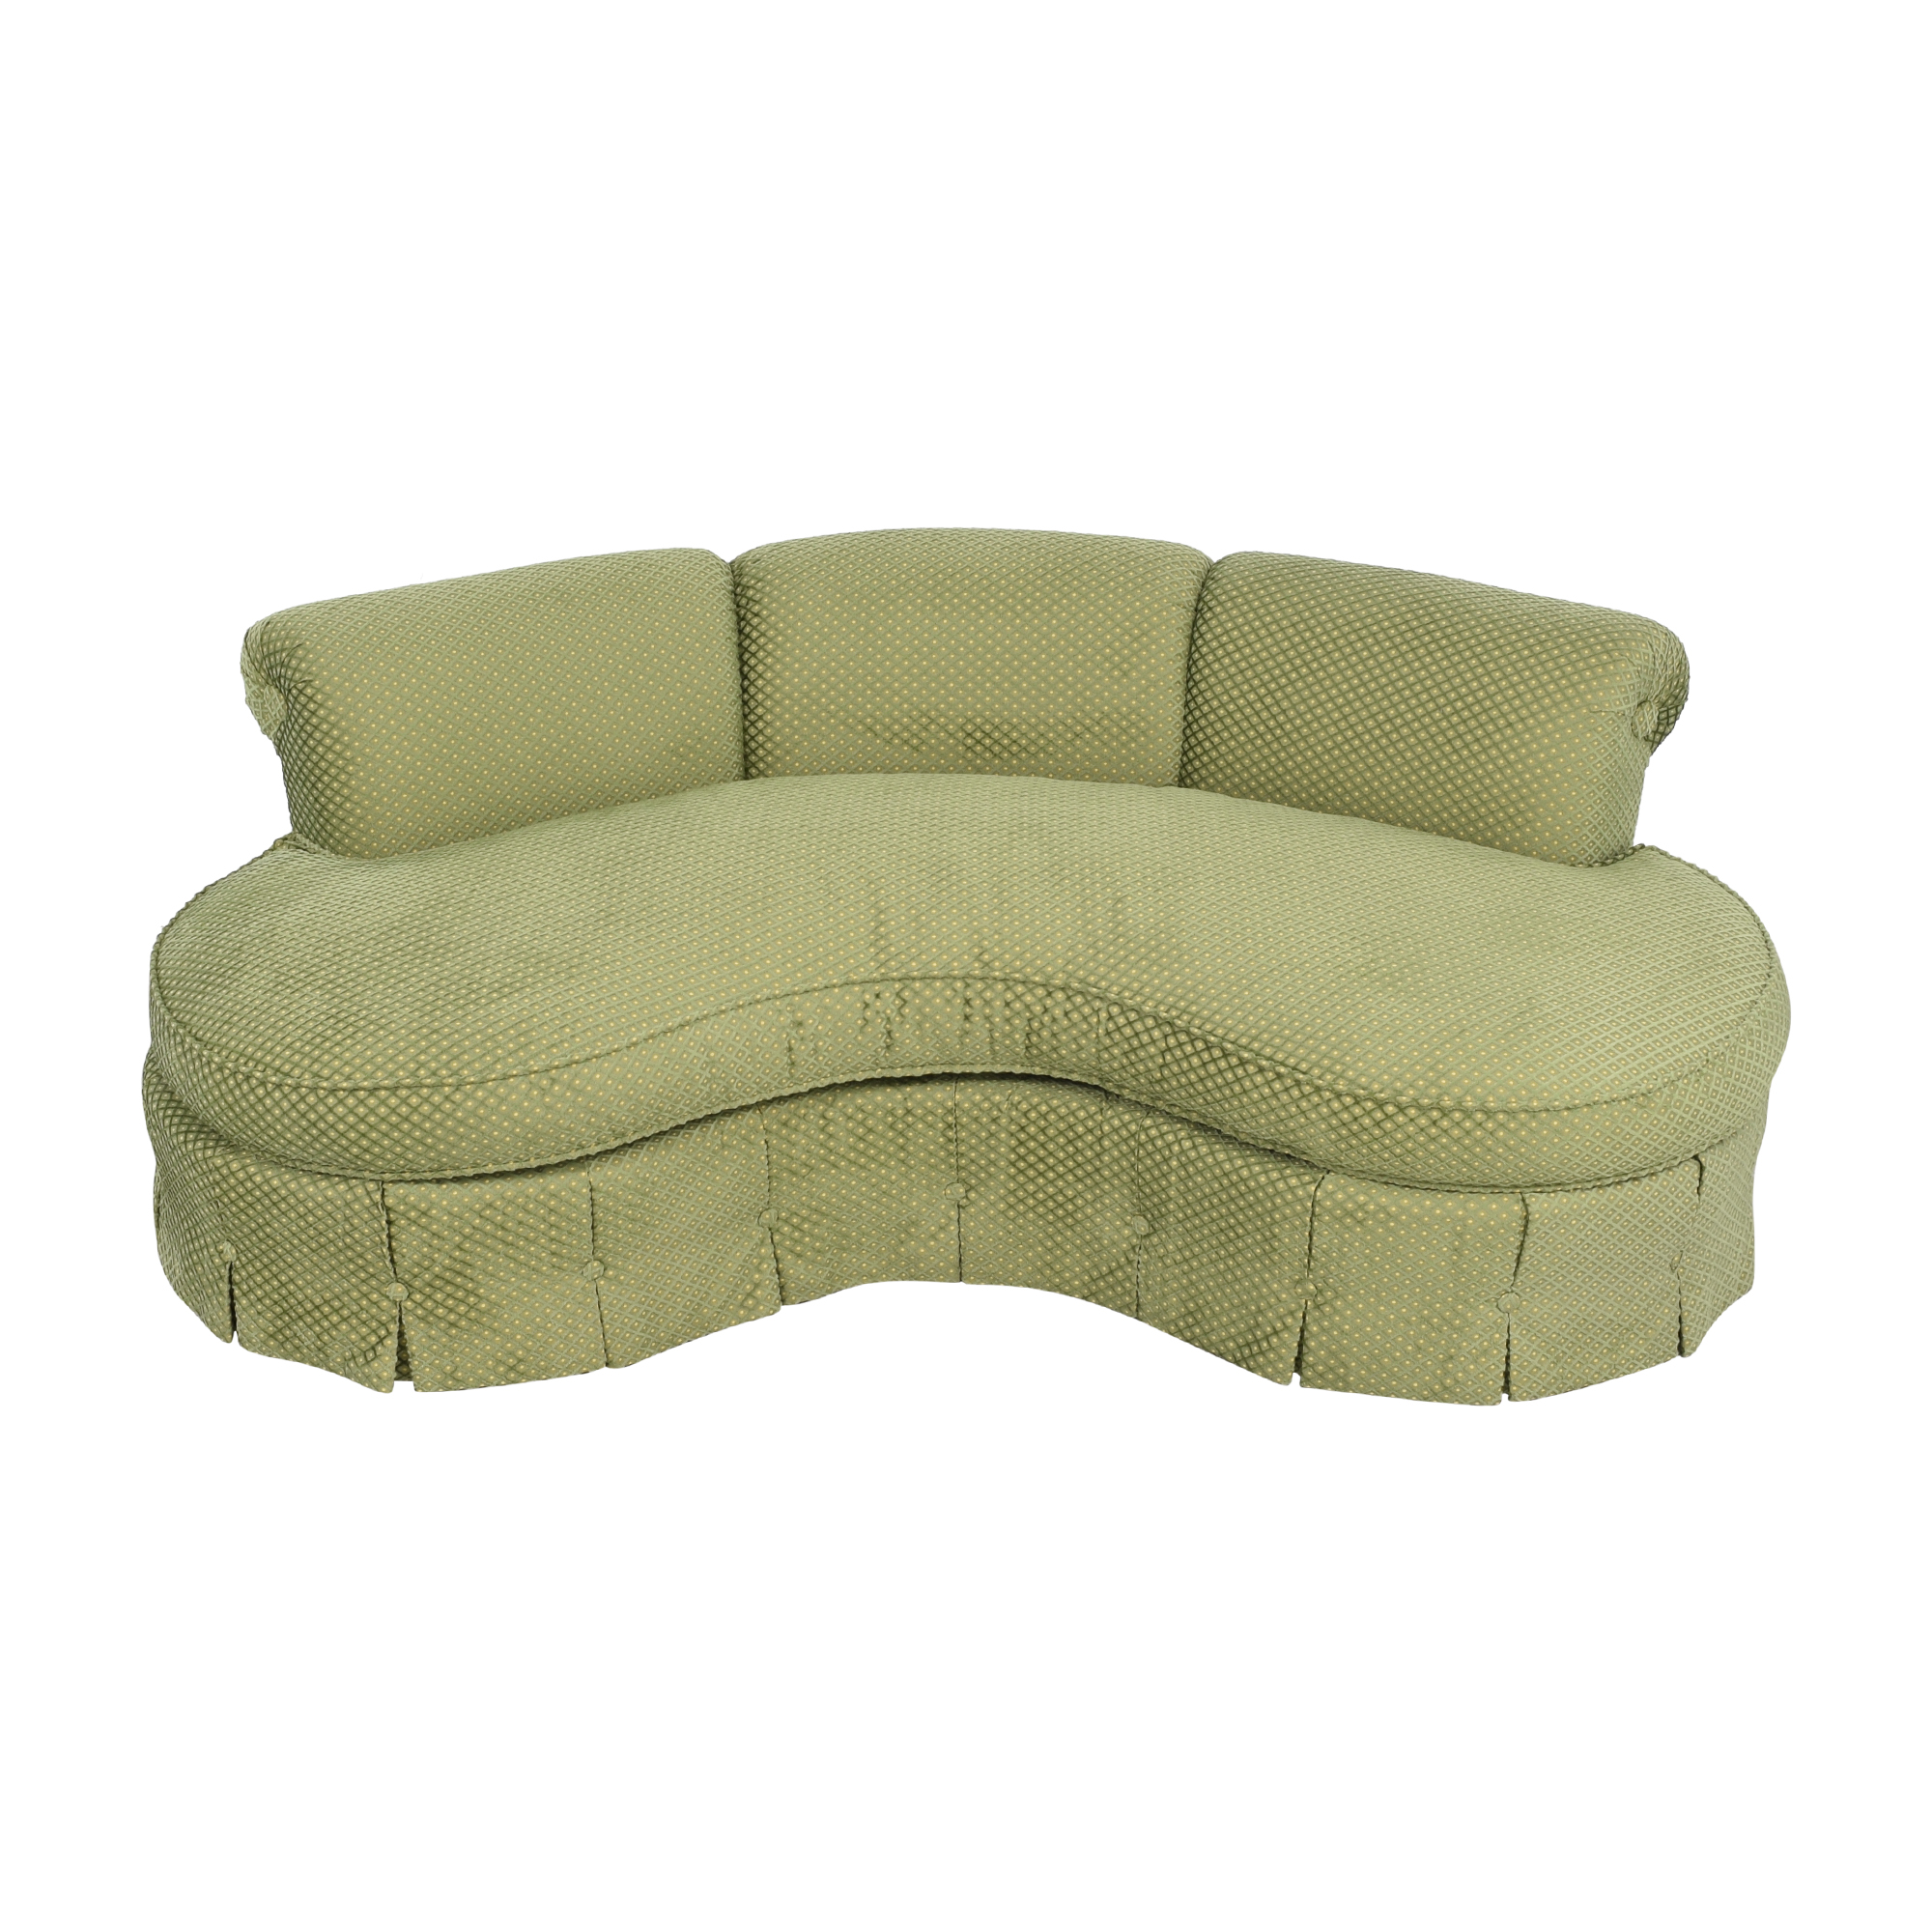 Custom Curved Sofa with Skirted Base and Matching Ottoman / Sofas